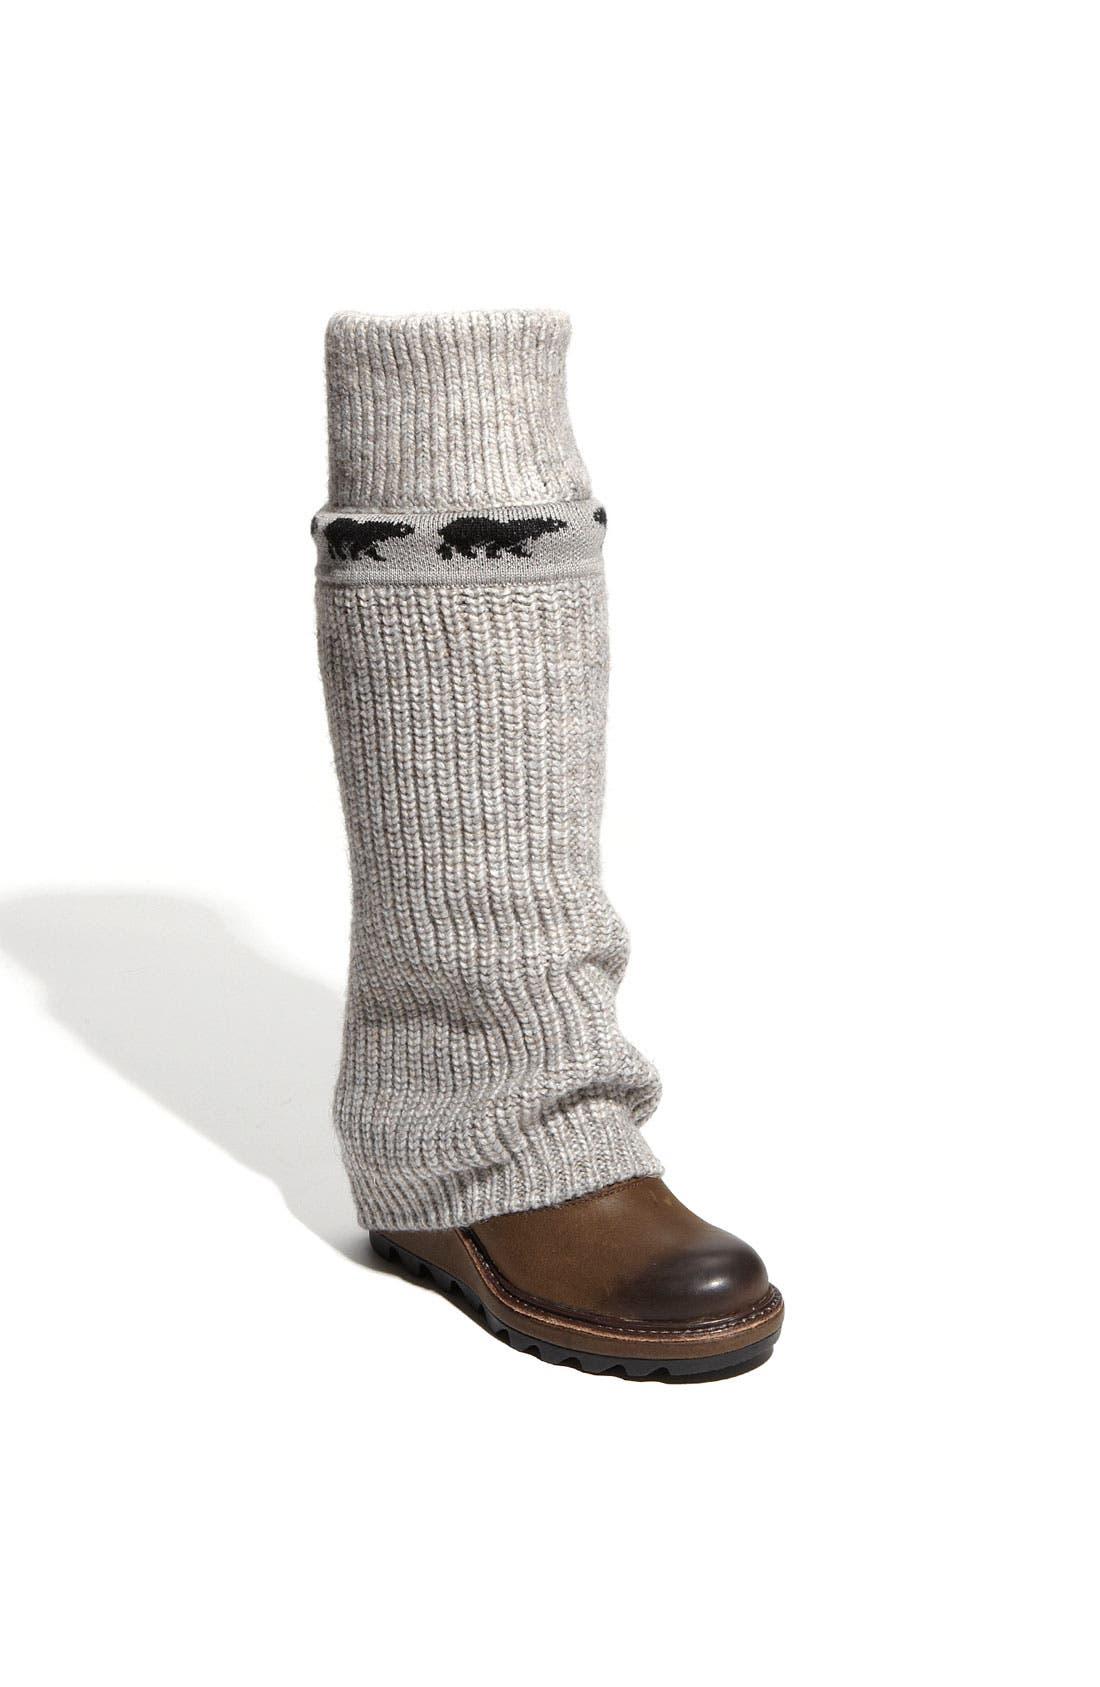 Alternate Image 1 Selected - Sorel 'Crazy Cabel' Wedge Boot